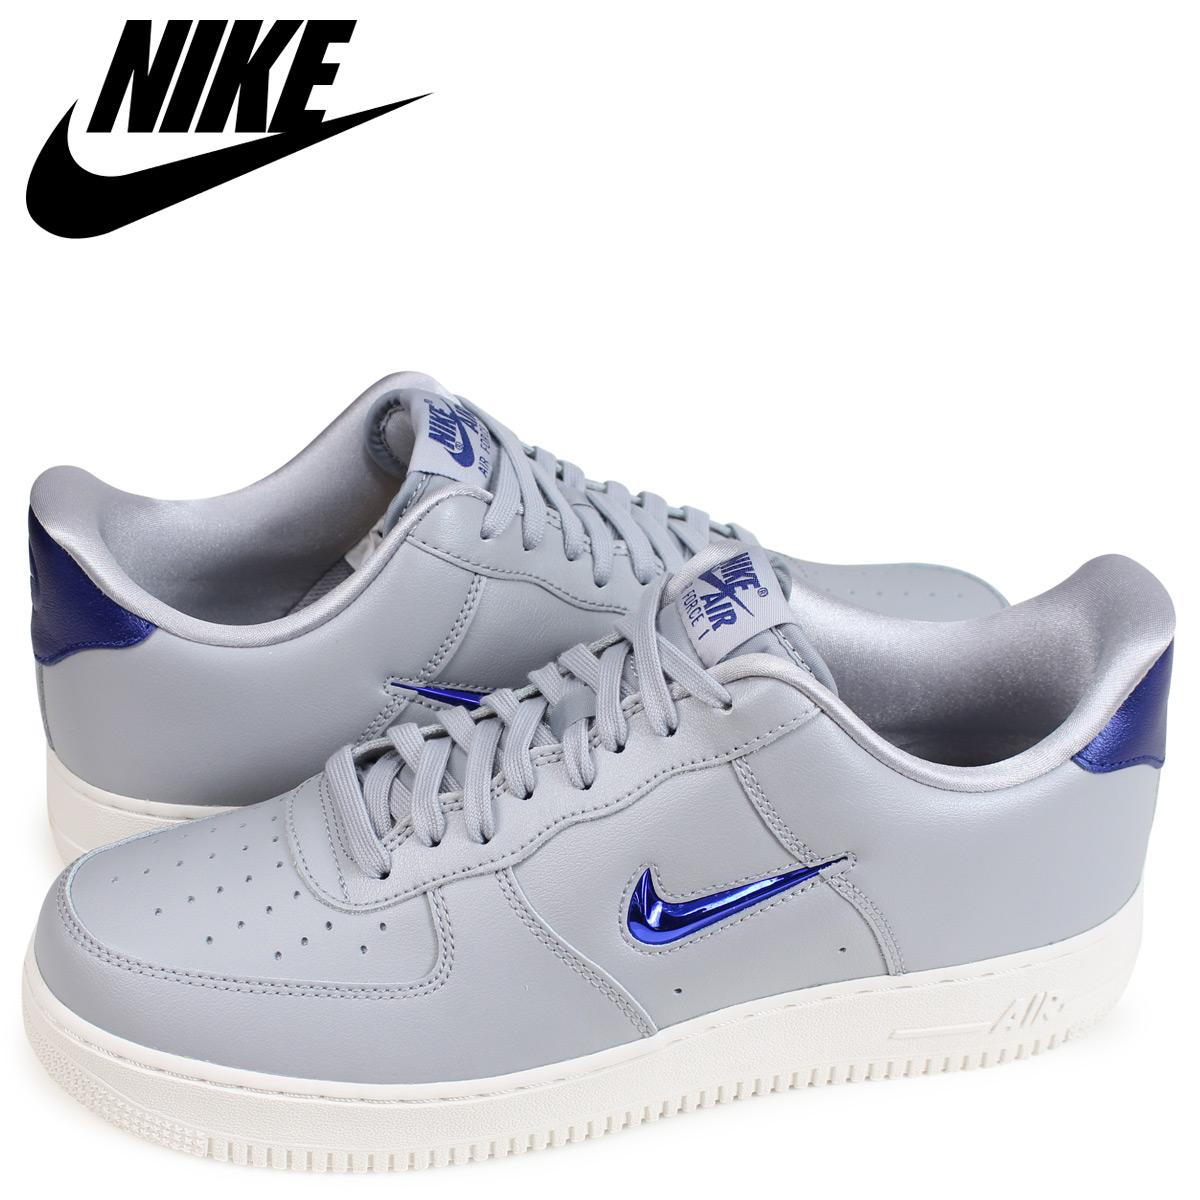 Air Lv8 Force Men Lthr 1 002 Sneakers 07 Aj9507 Nike Gray 5SARjLqc43